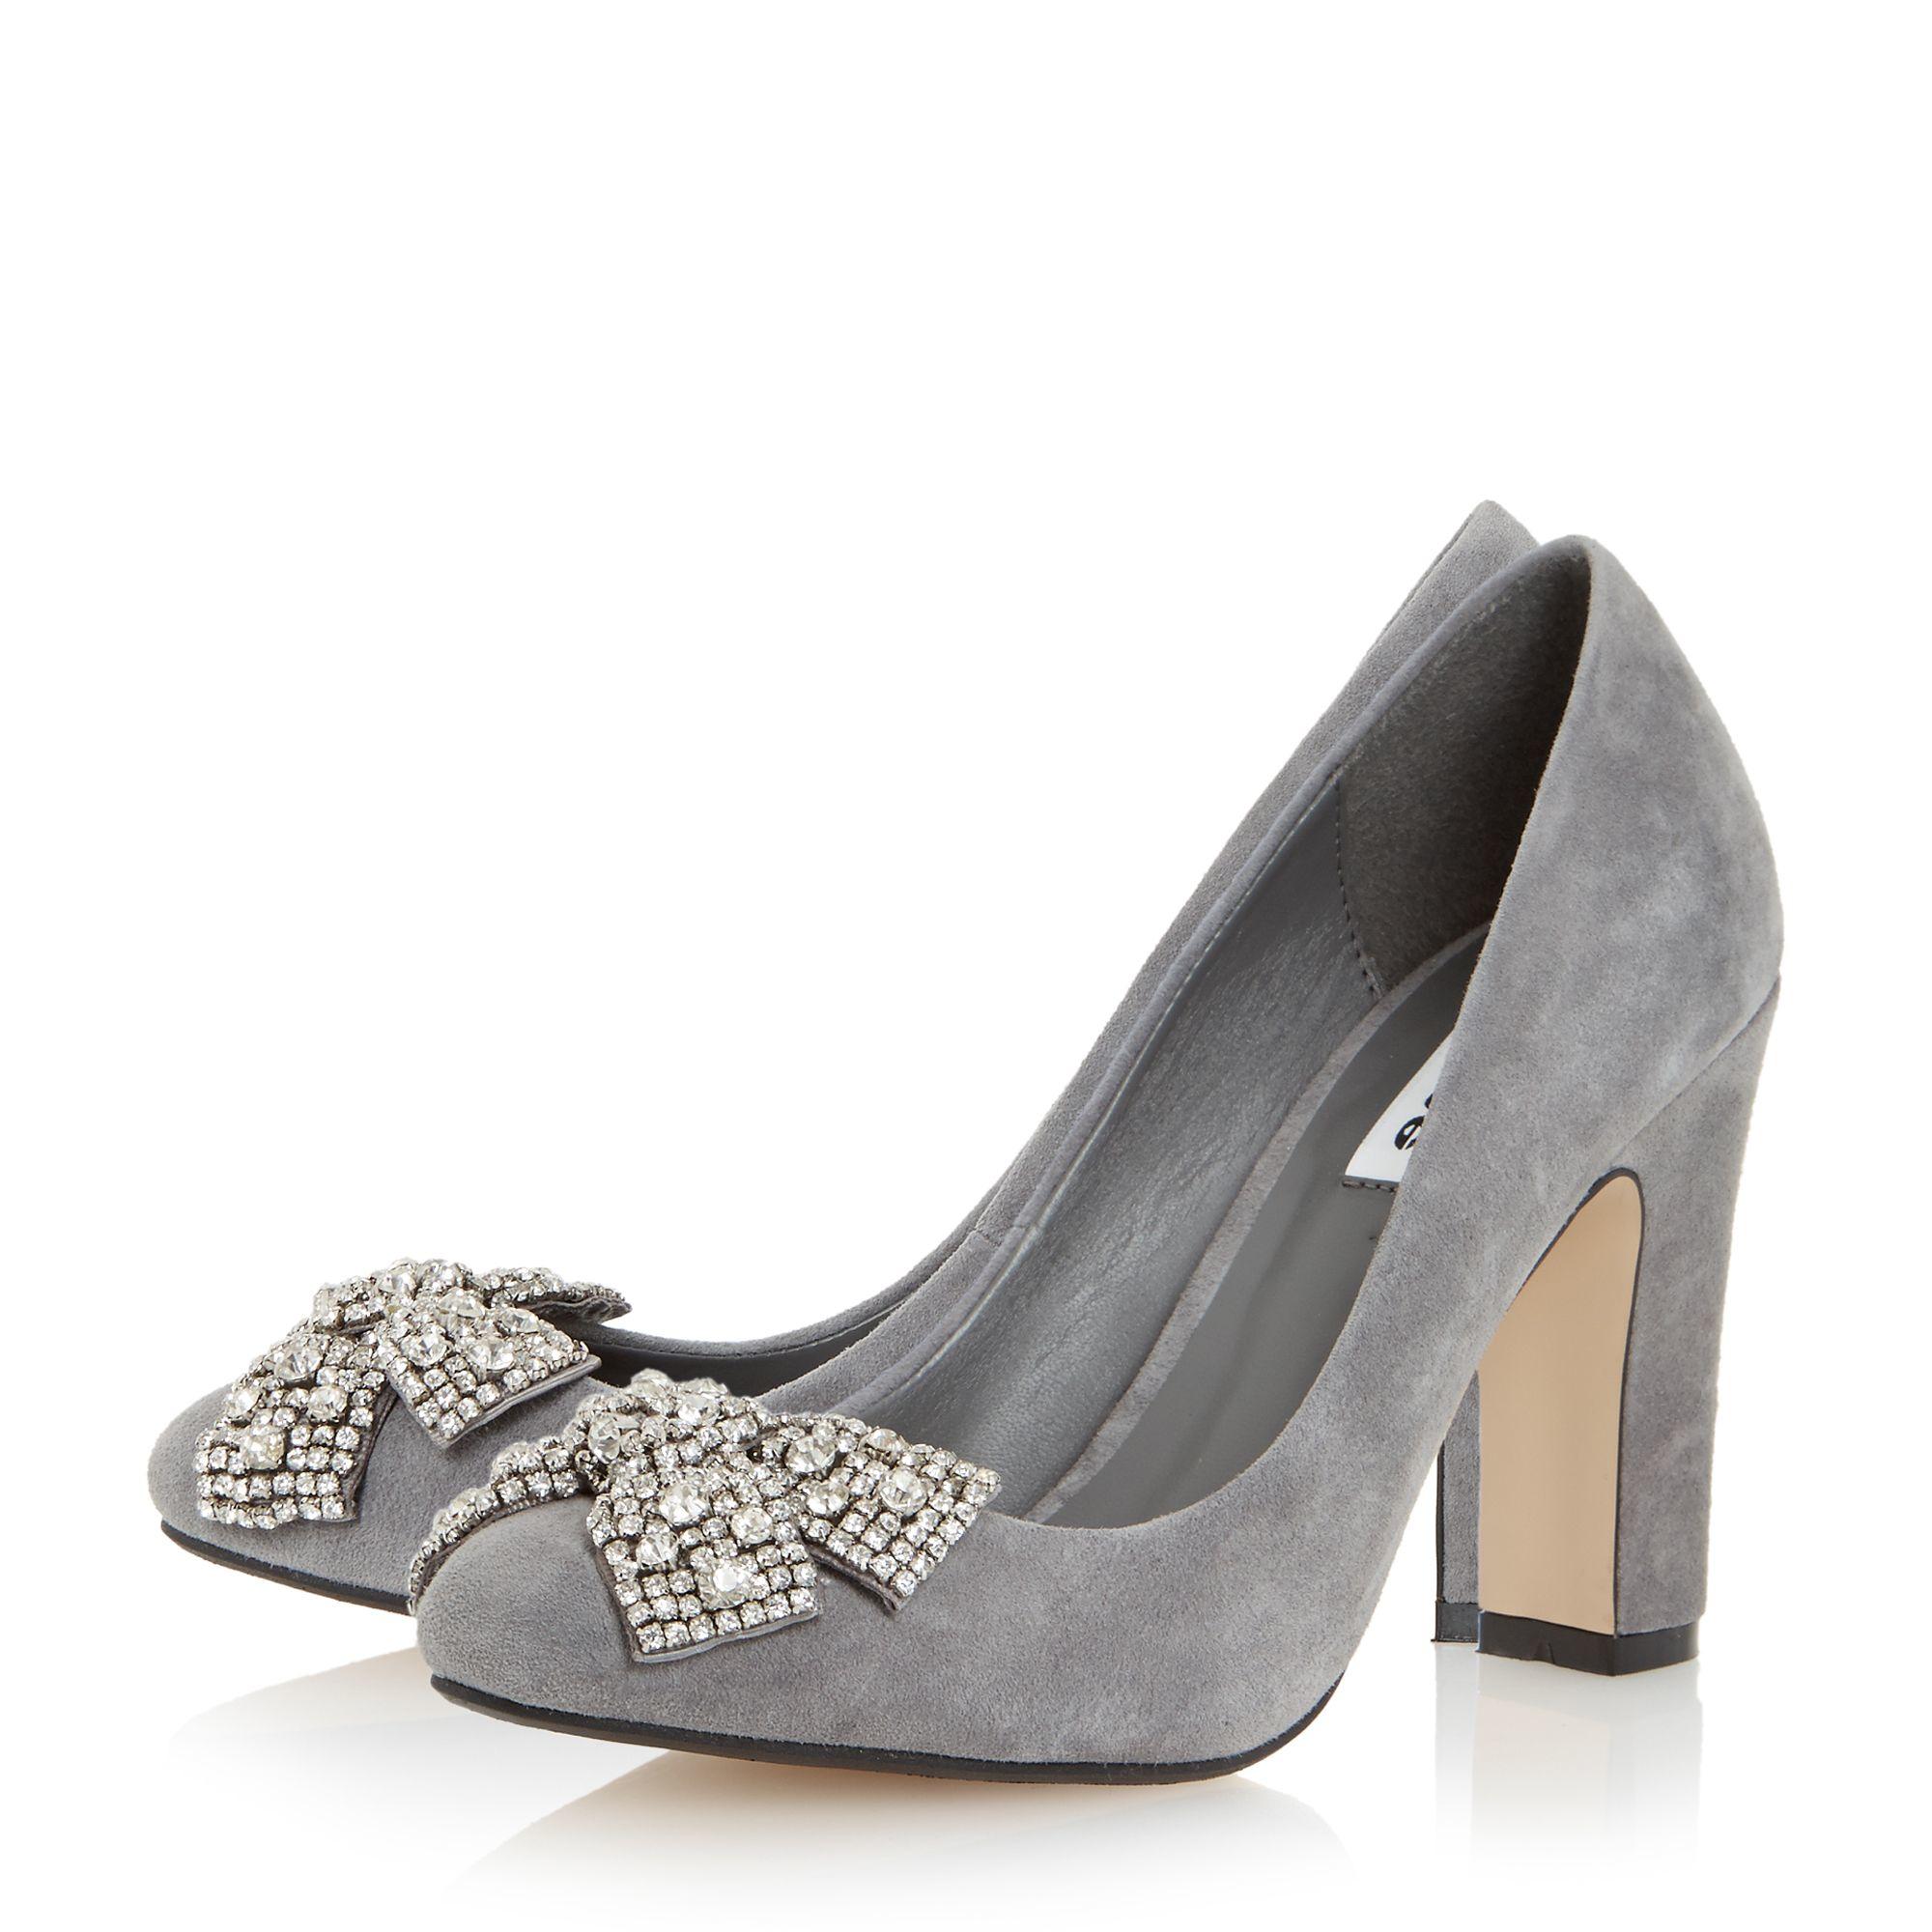 Black Suede Platform Shoes By Dune